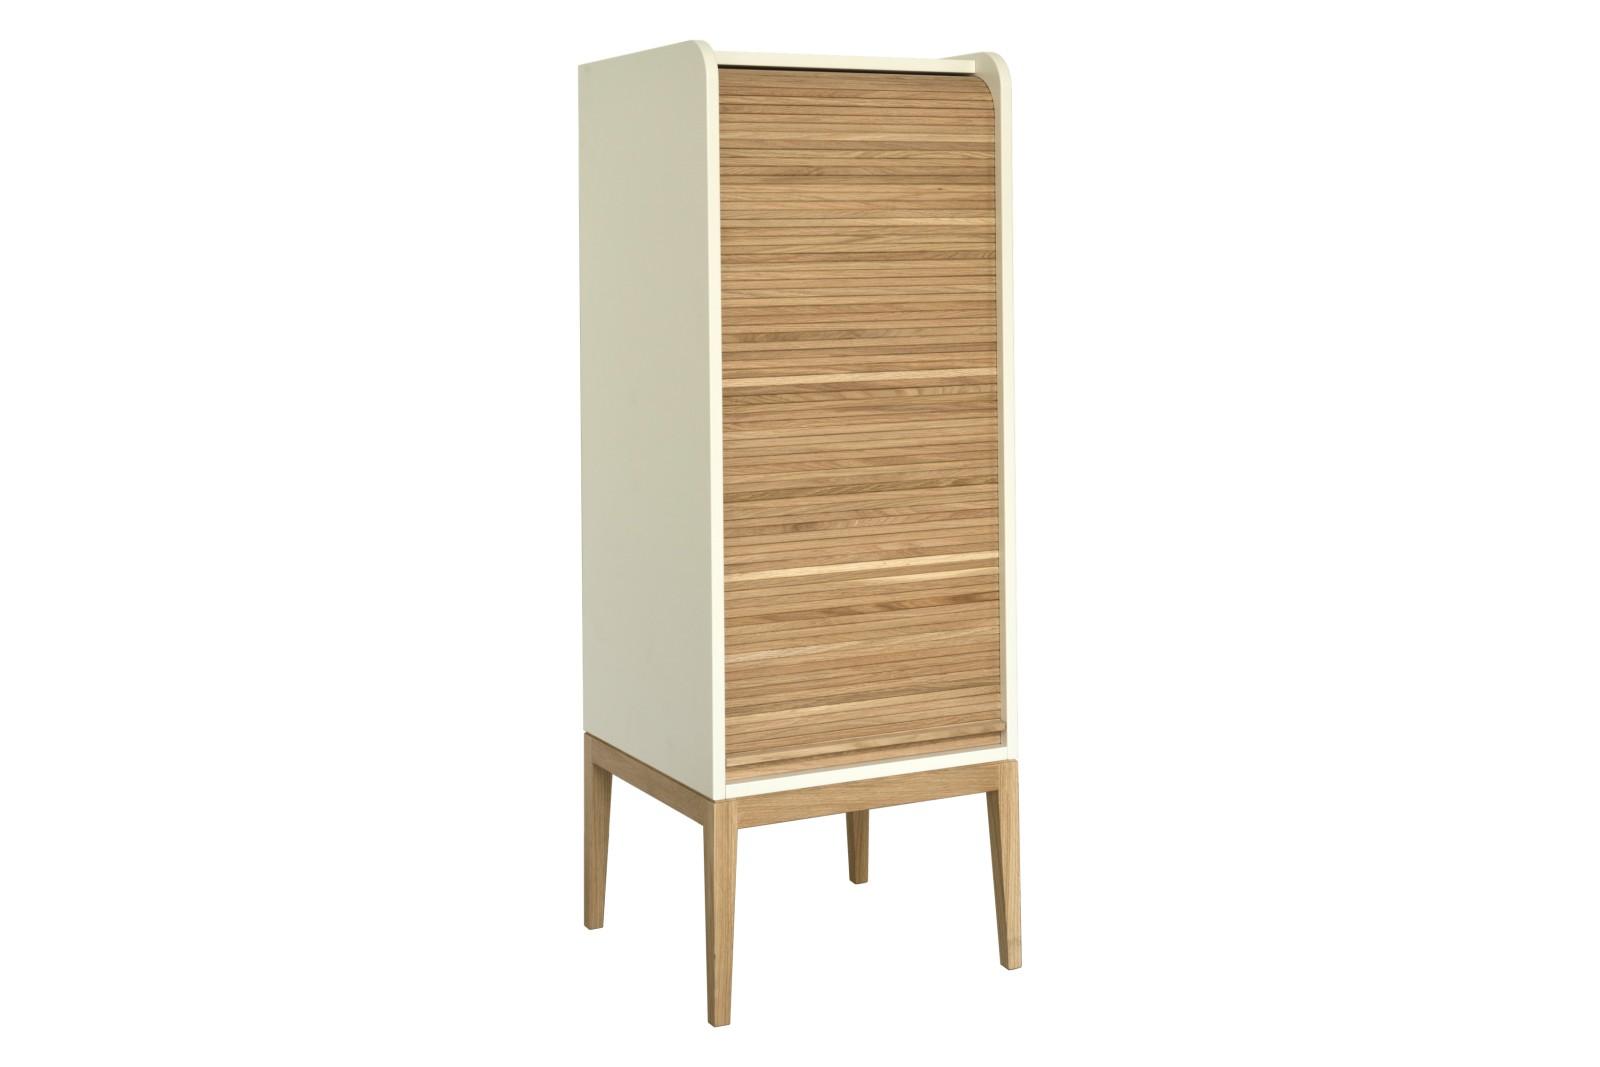 Tapparelle Cabinet White, Medium